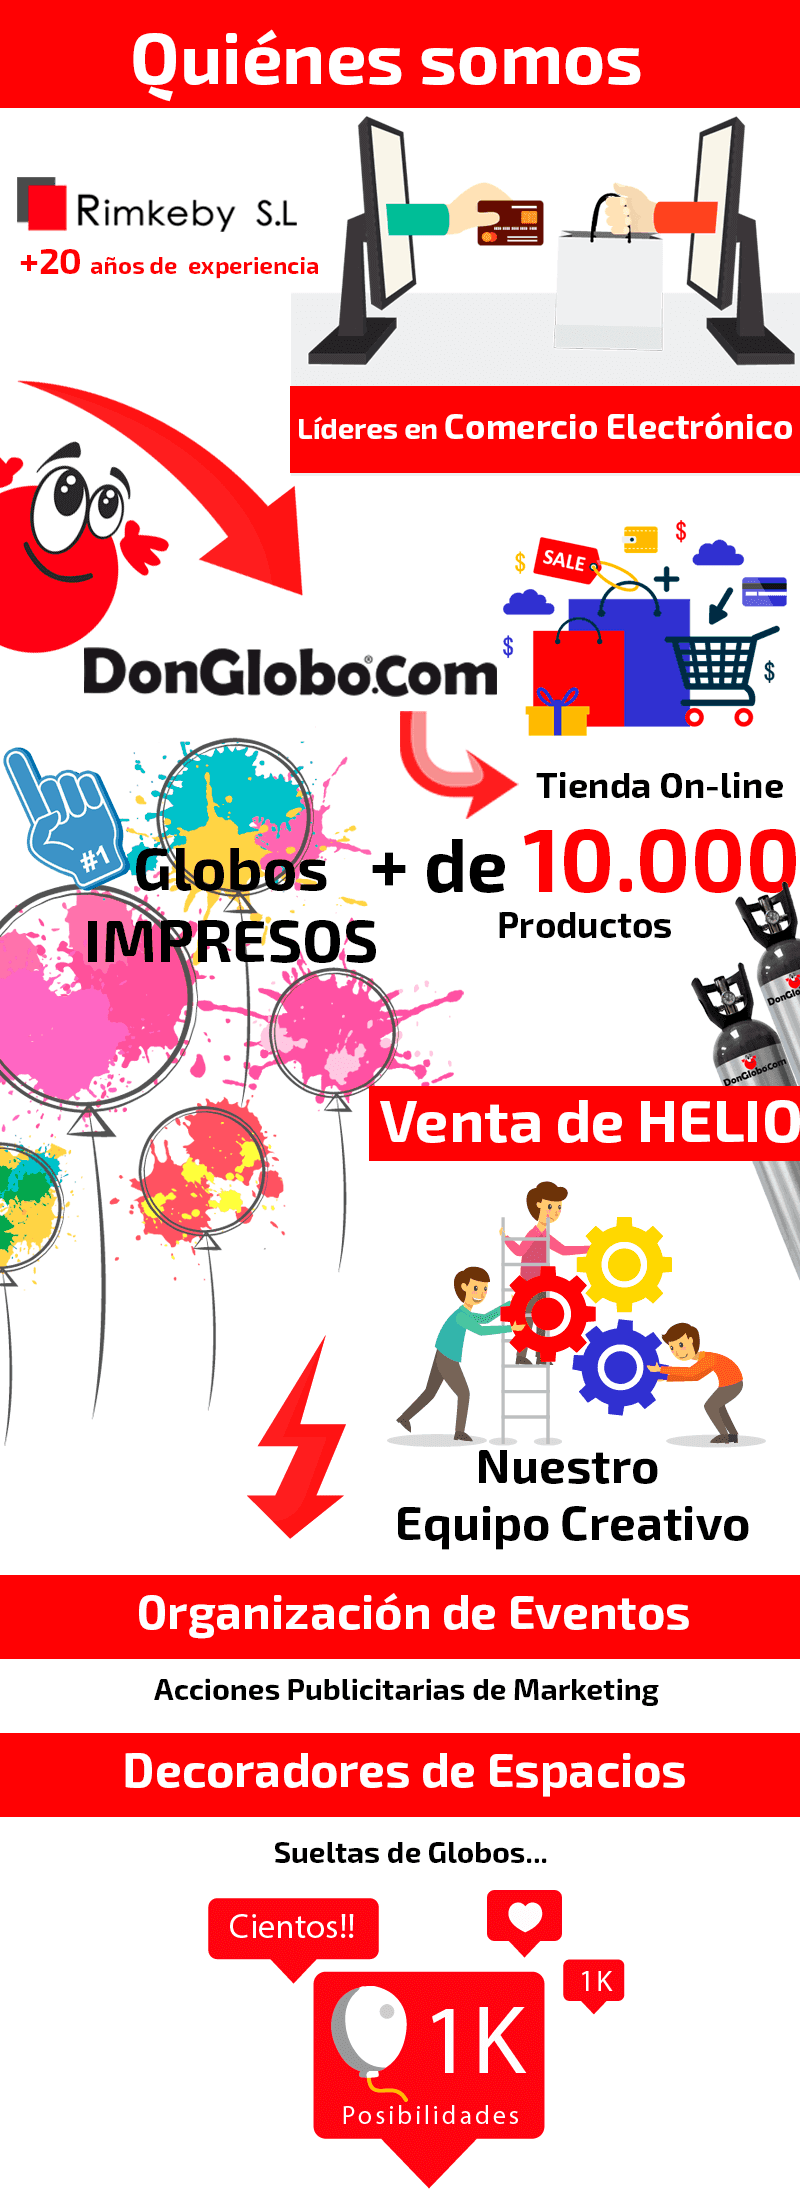 Infografia DonGlobo